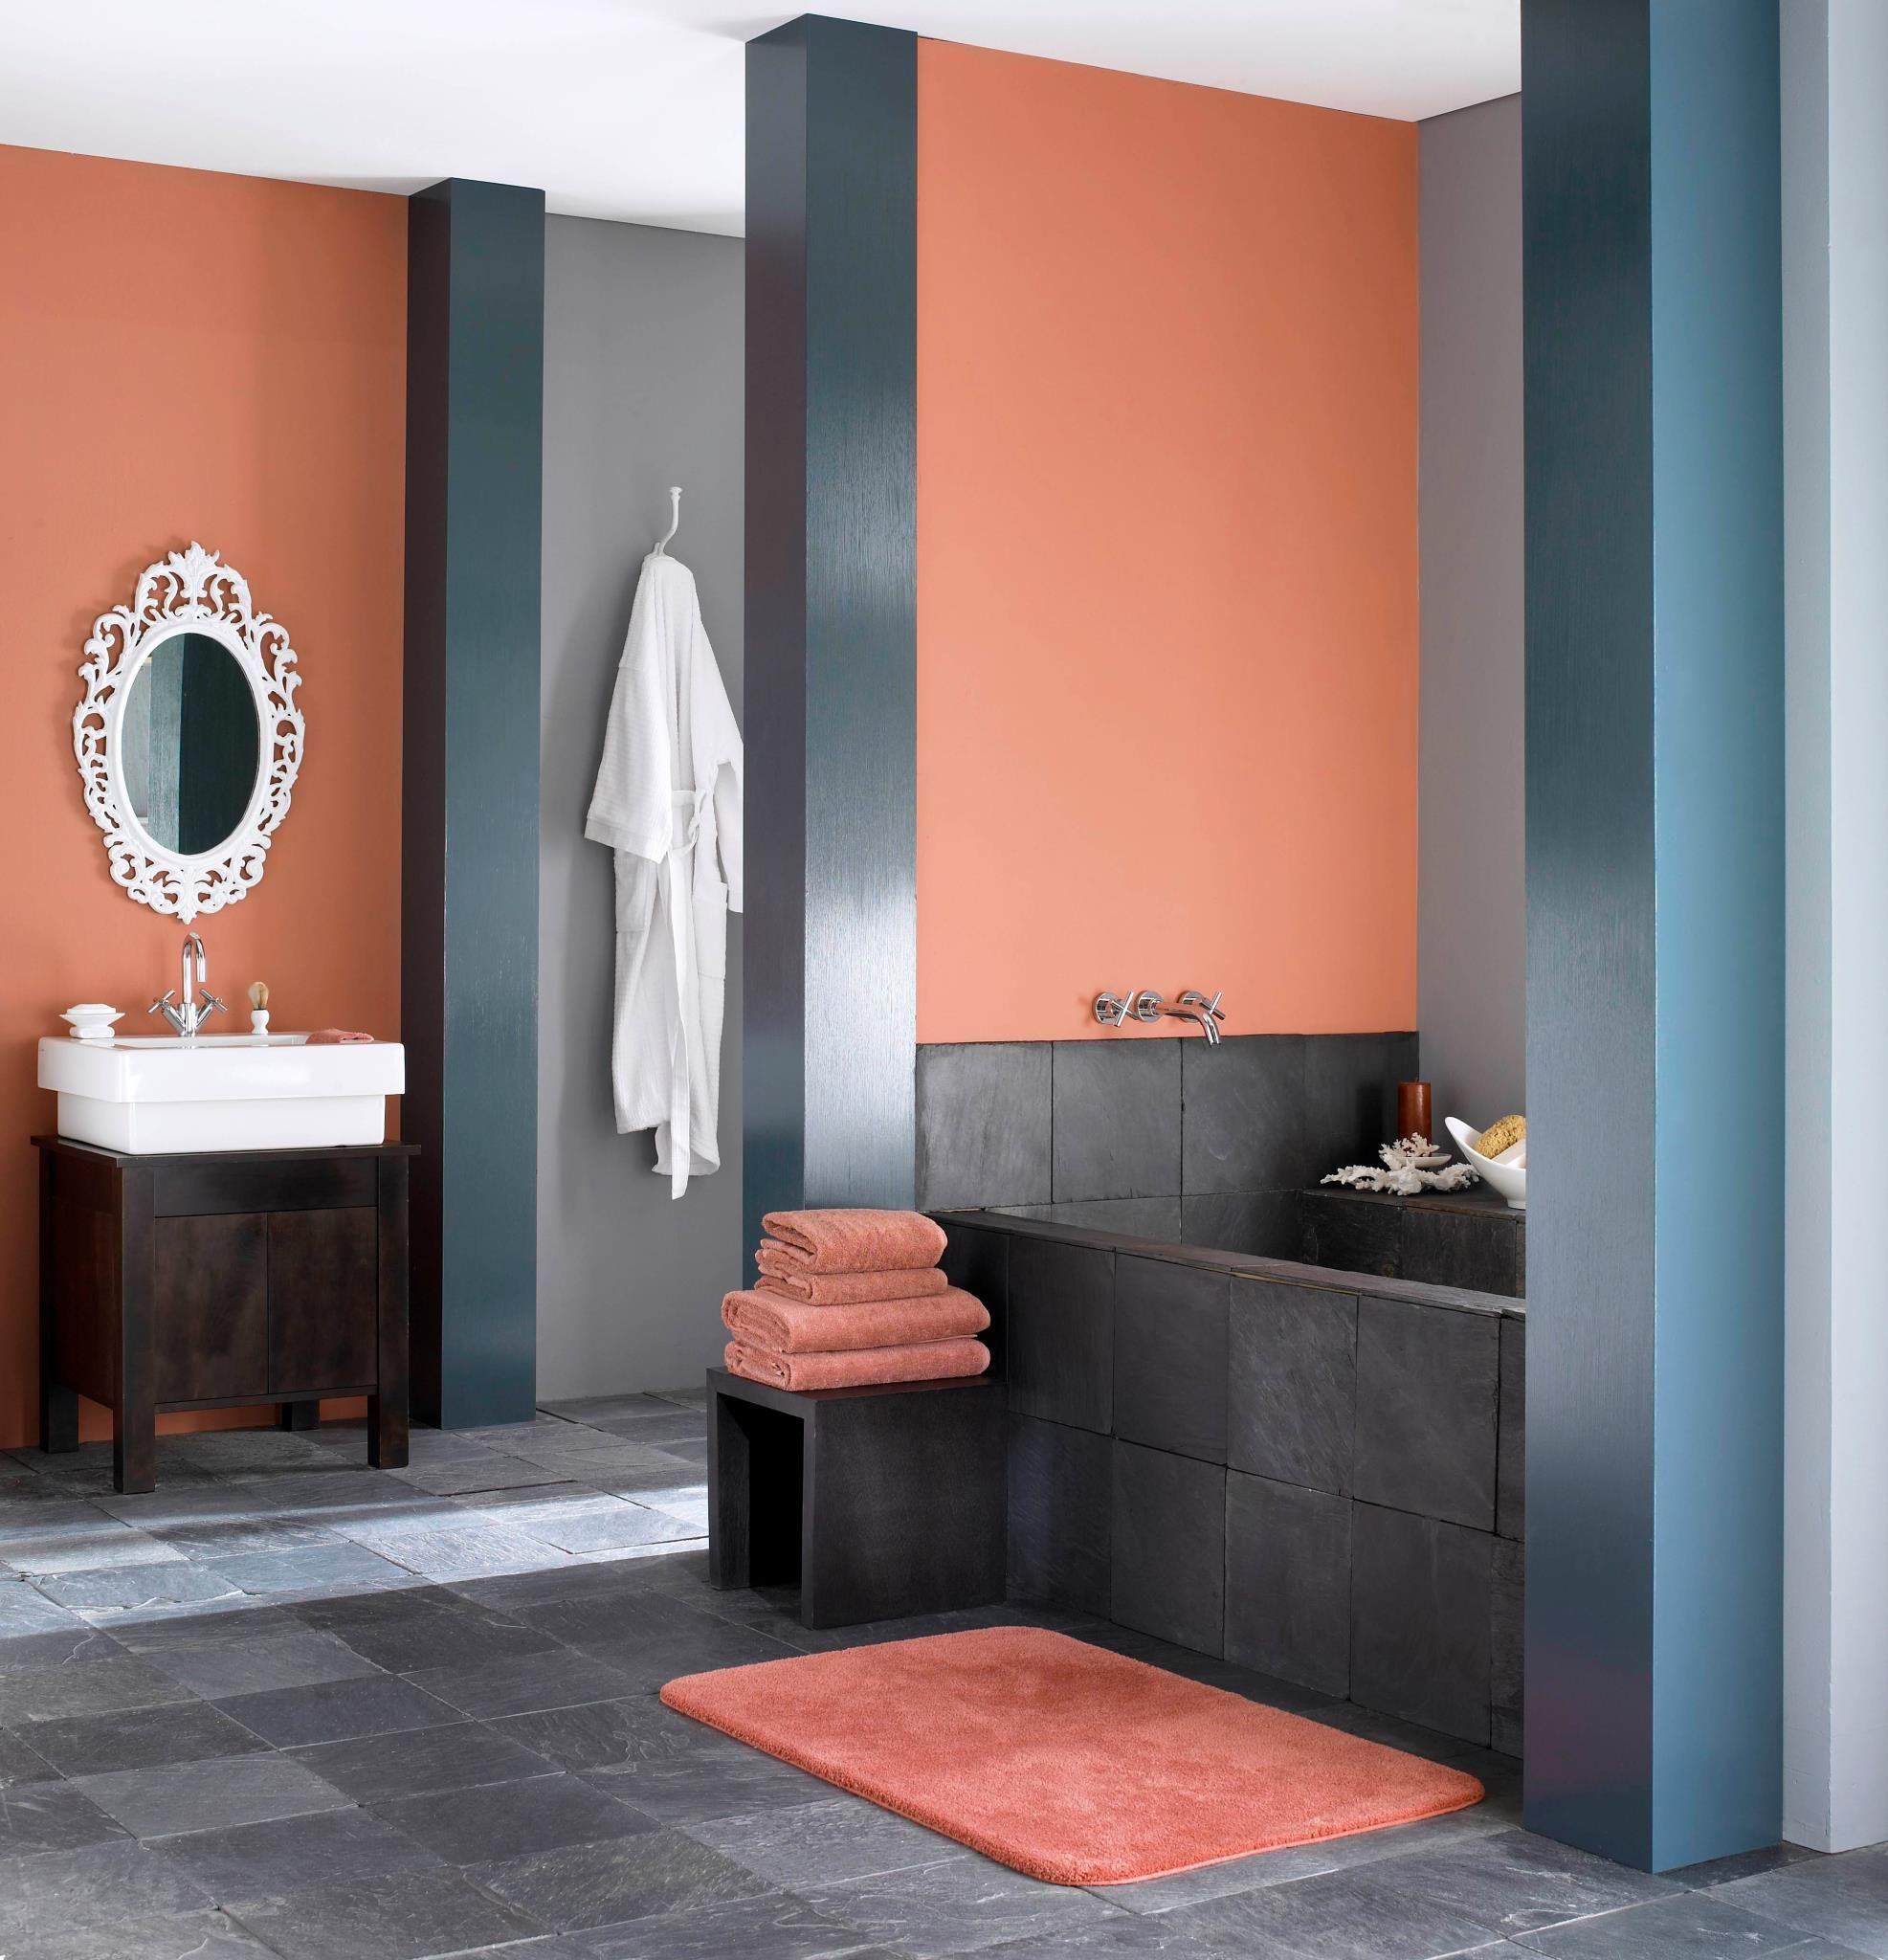 Gray Bathrooms With Accent Color: Benjamin Moore Coral Bronze 1298, Narragansett Green HC